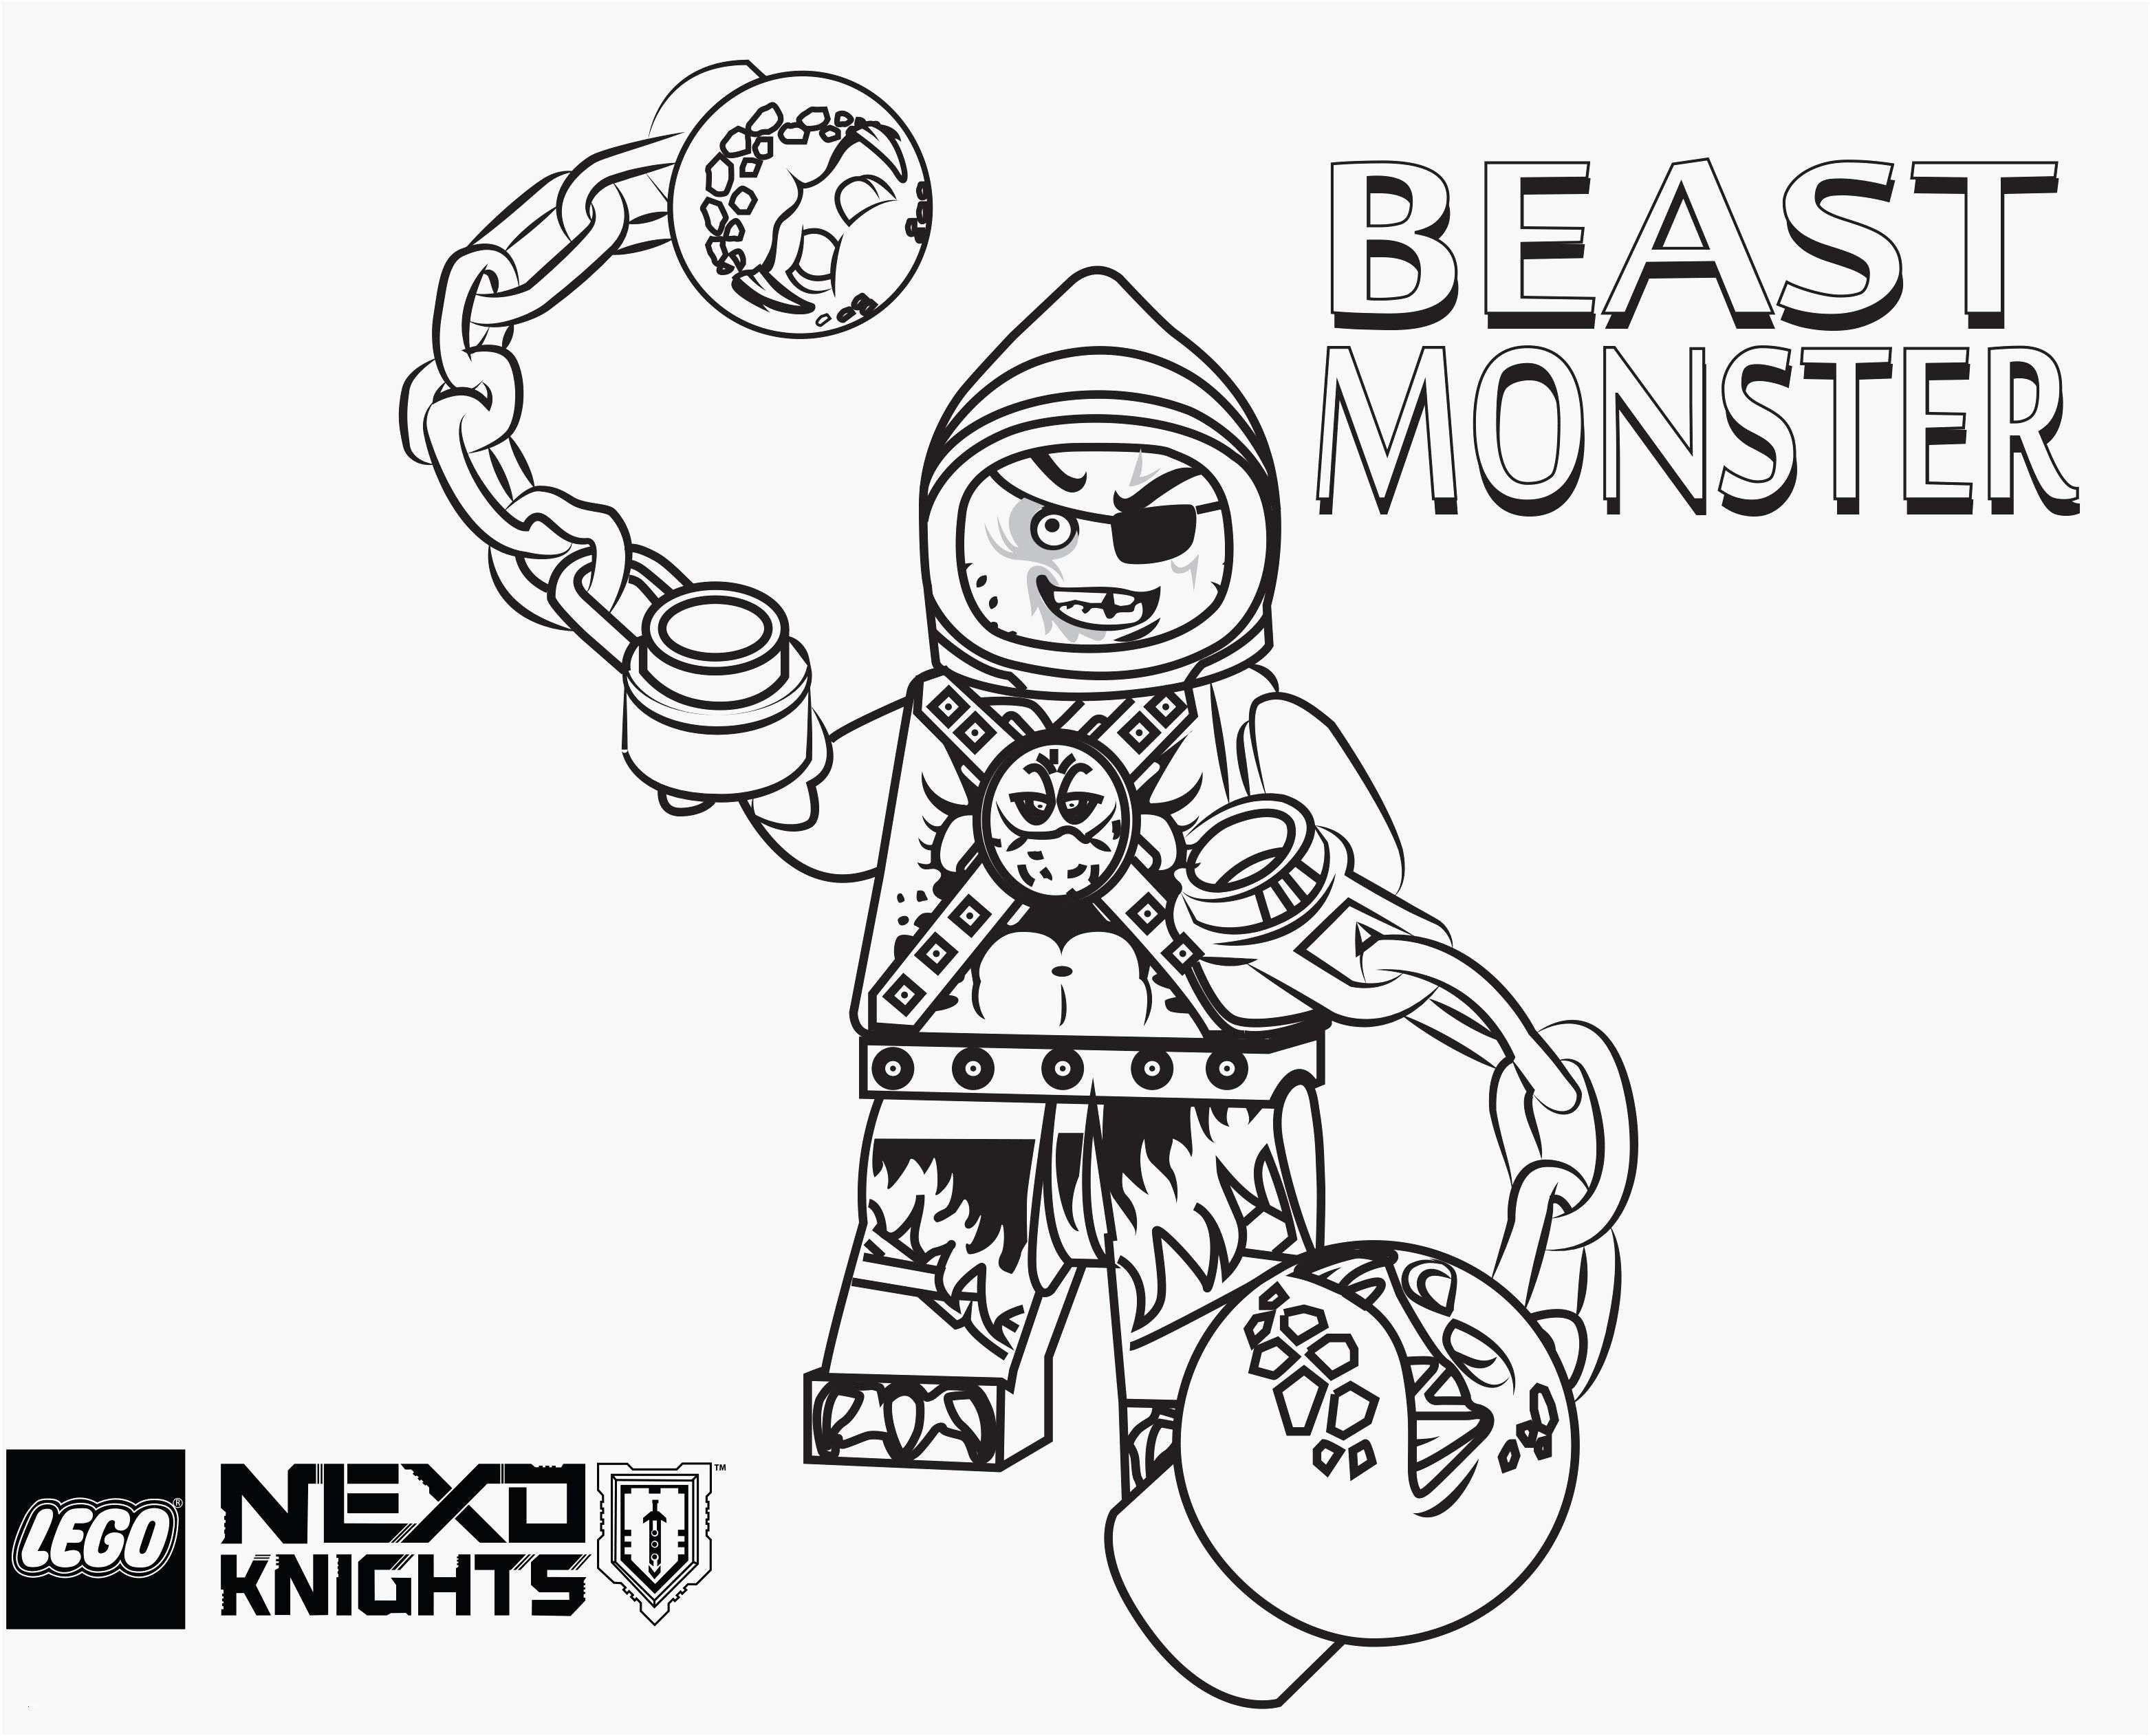 Frisch Malvorlagen Pj Masks Lego Coloring Pages Monster Coloring Pages Train Coloring Pages